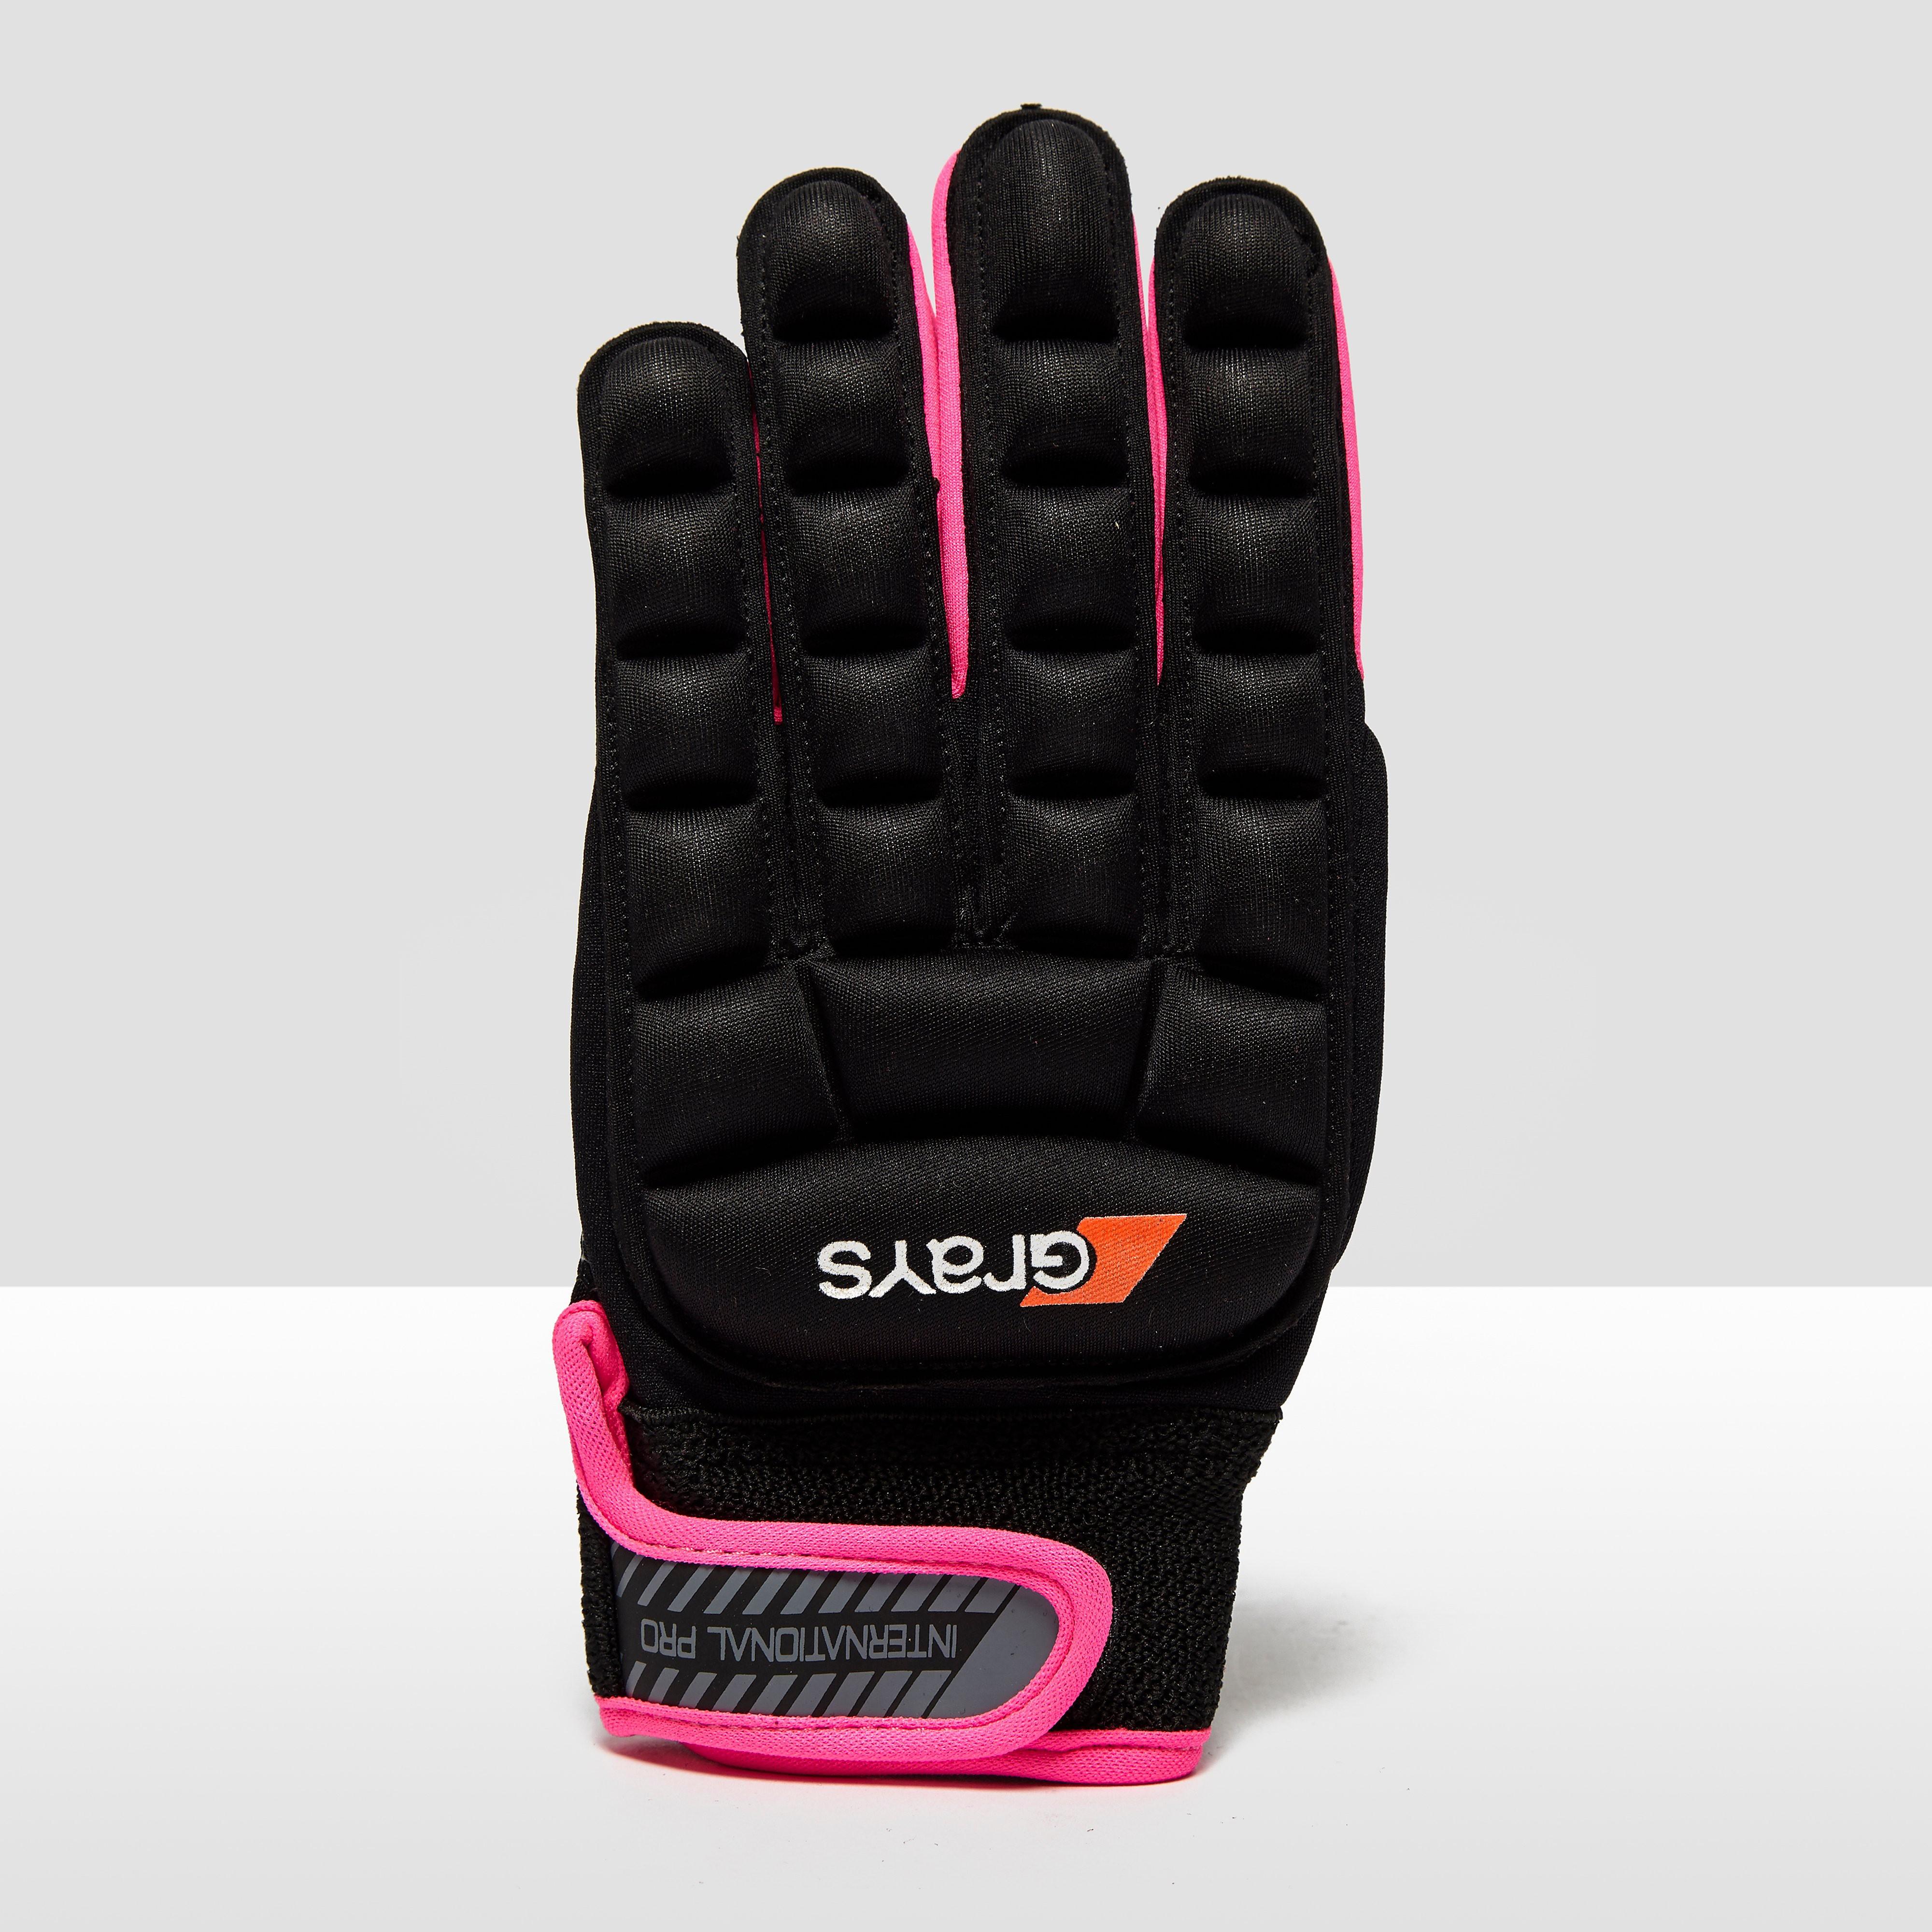 Grays International Pro Left Hand Glove